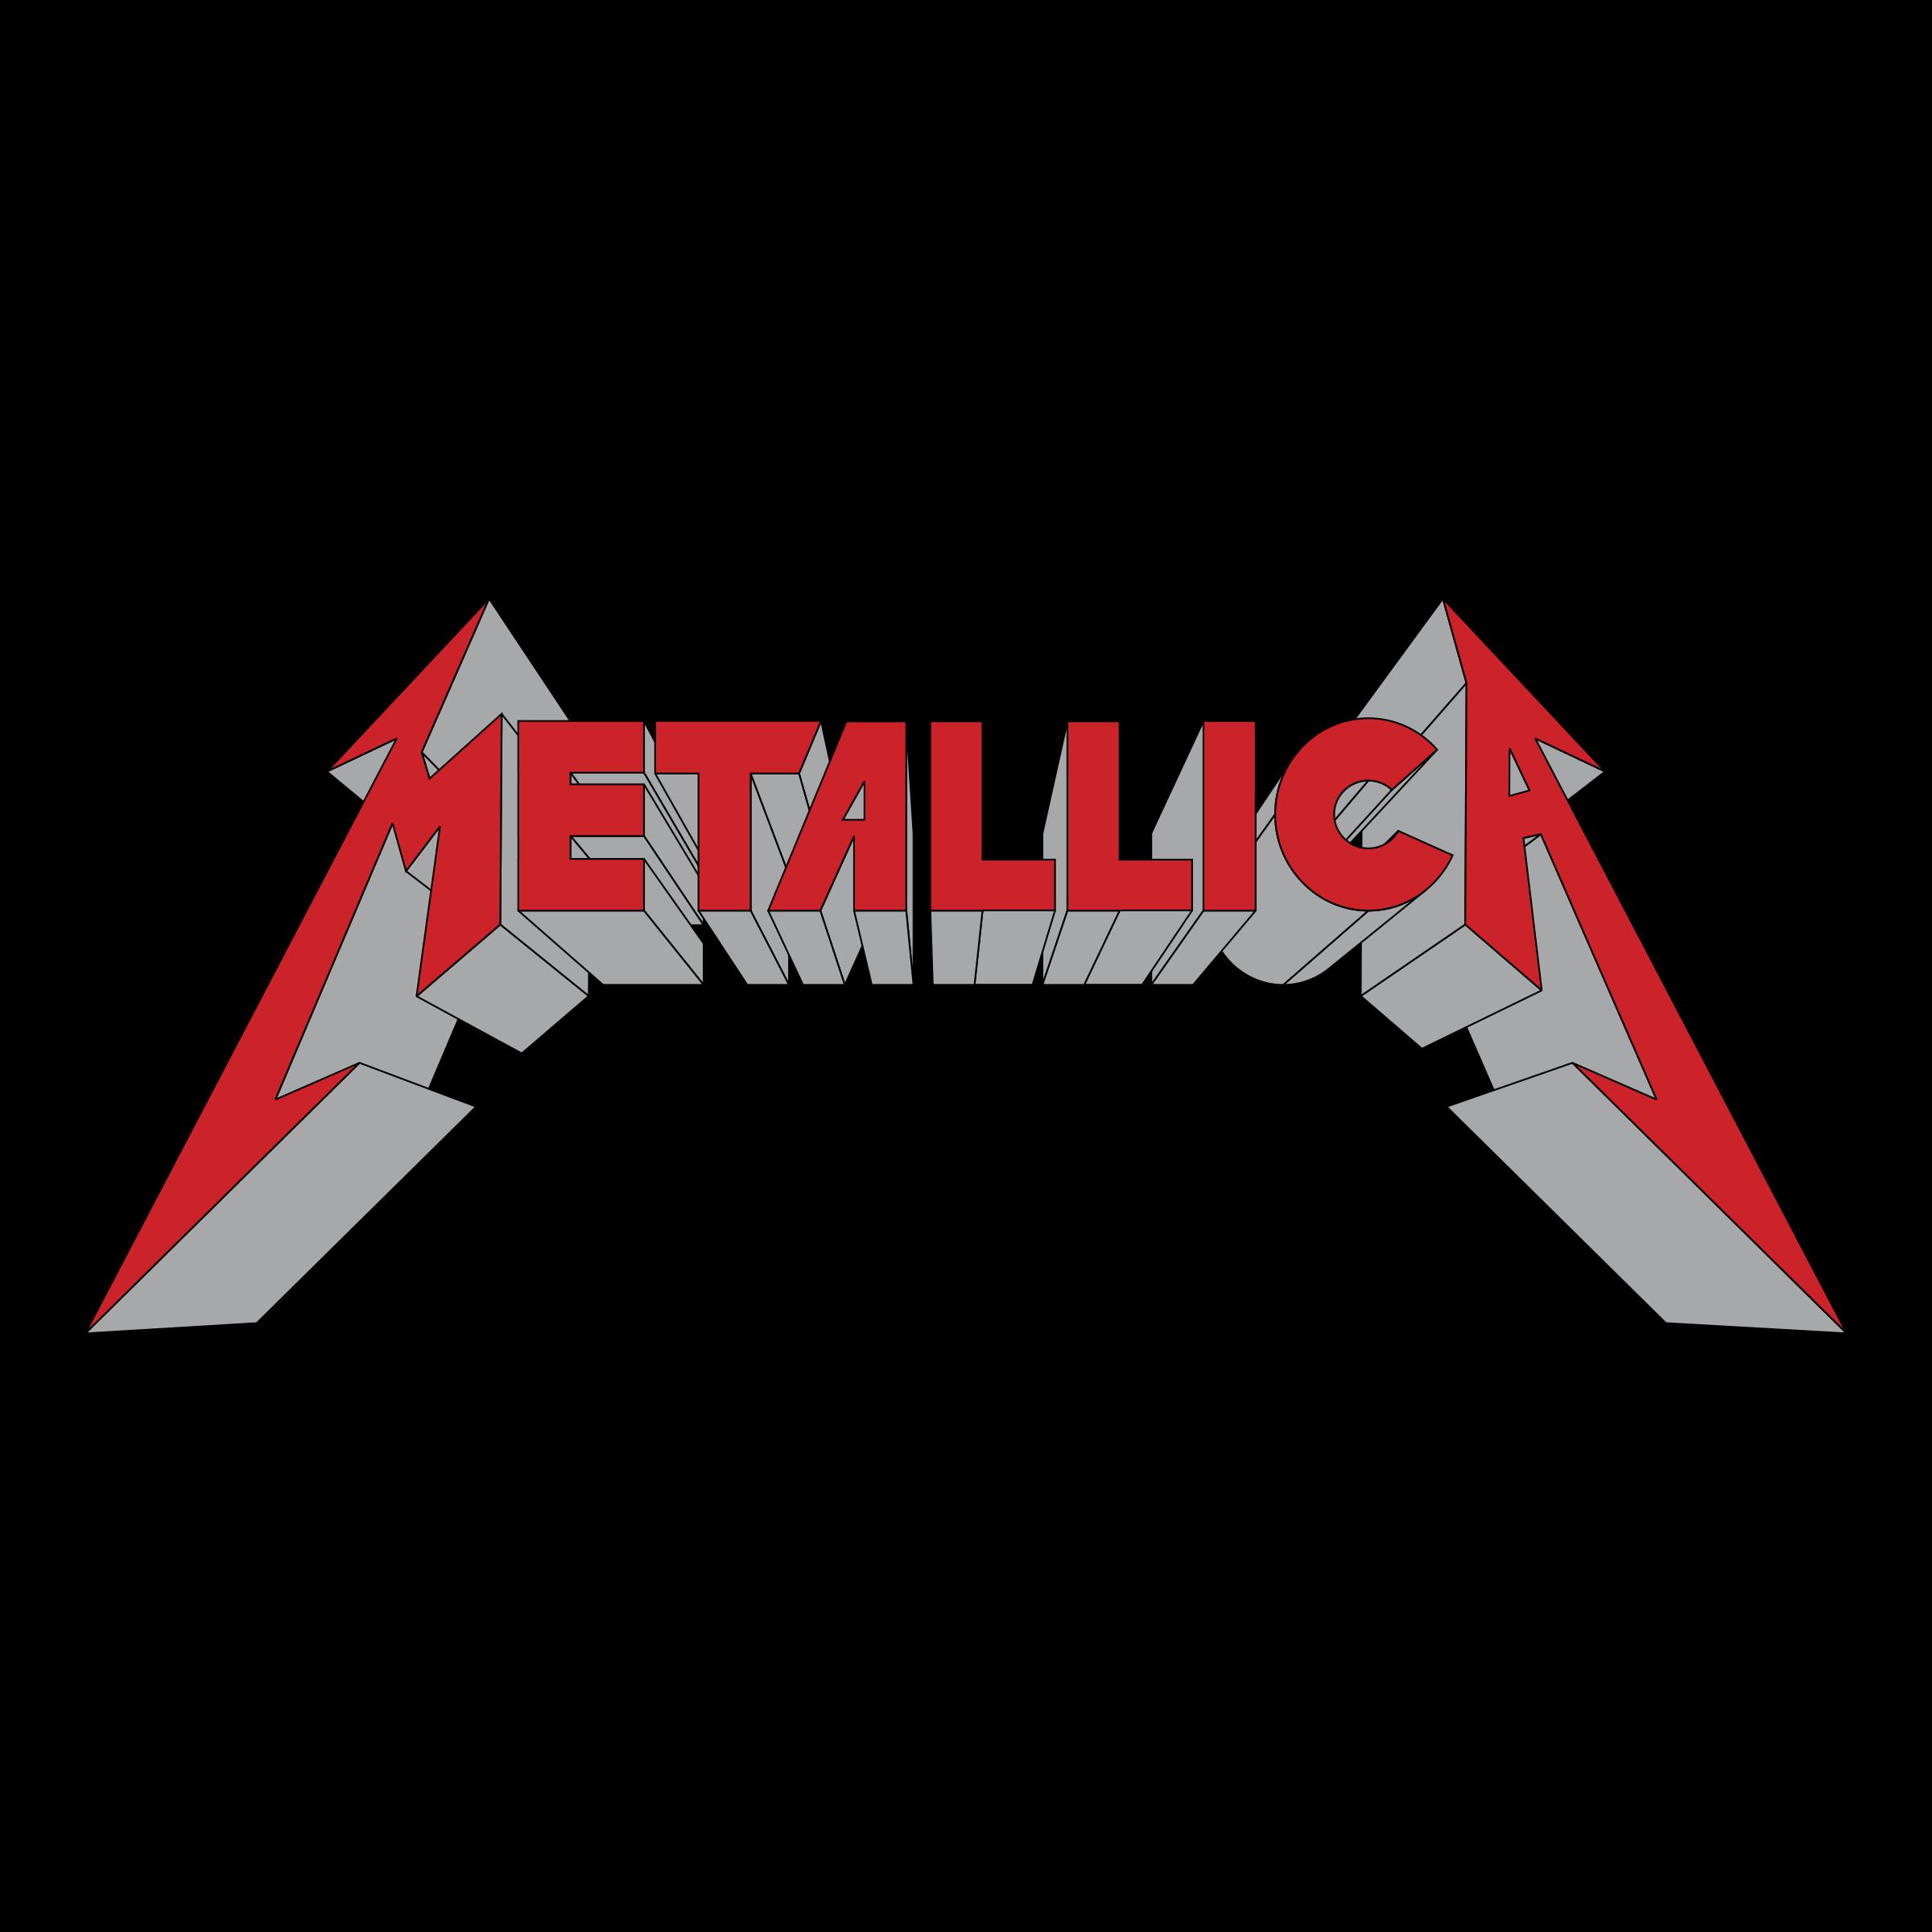 Metallica Logo PNG Transparent & SVG Vector - Freebie Supply